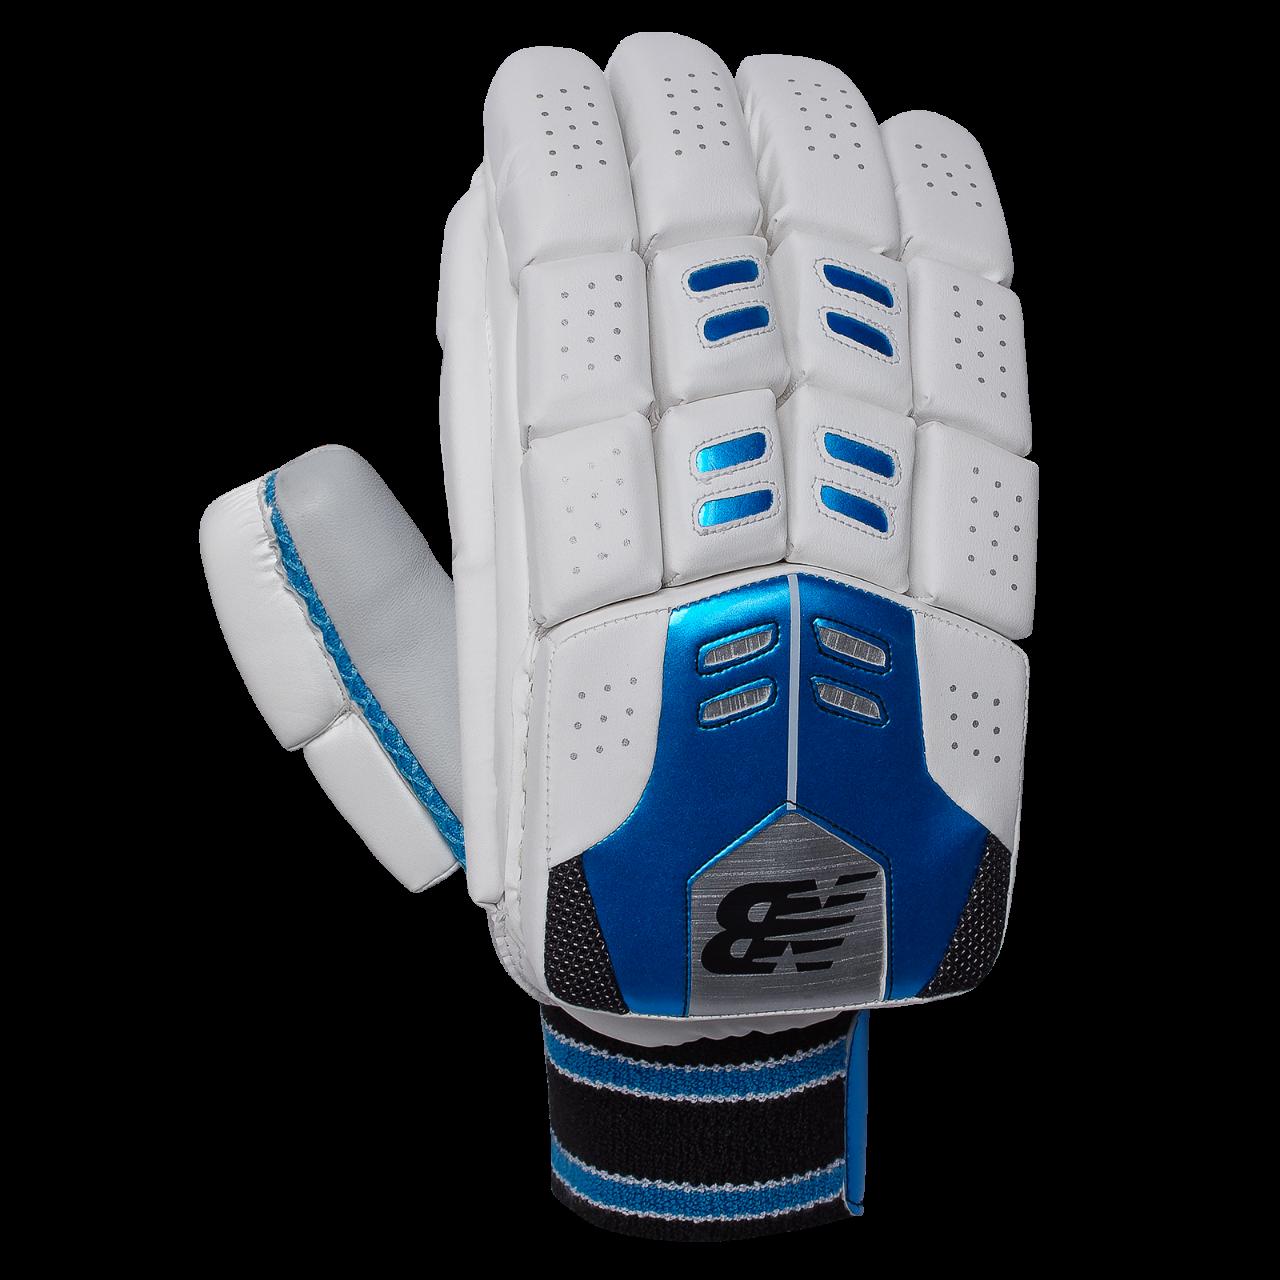 2021 New Balance DC 680 Batting Gloves